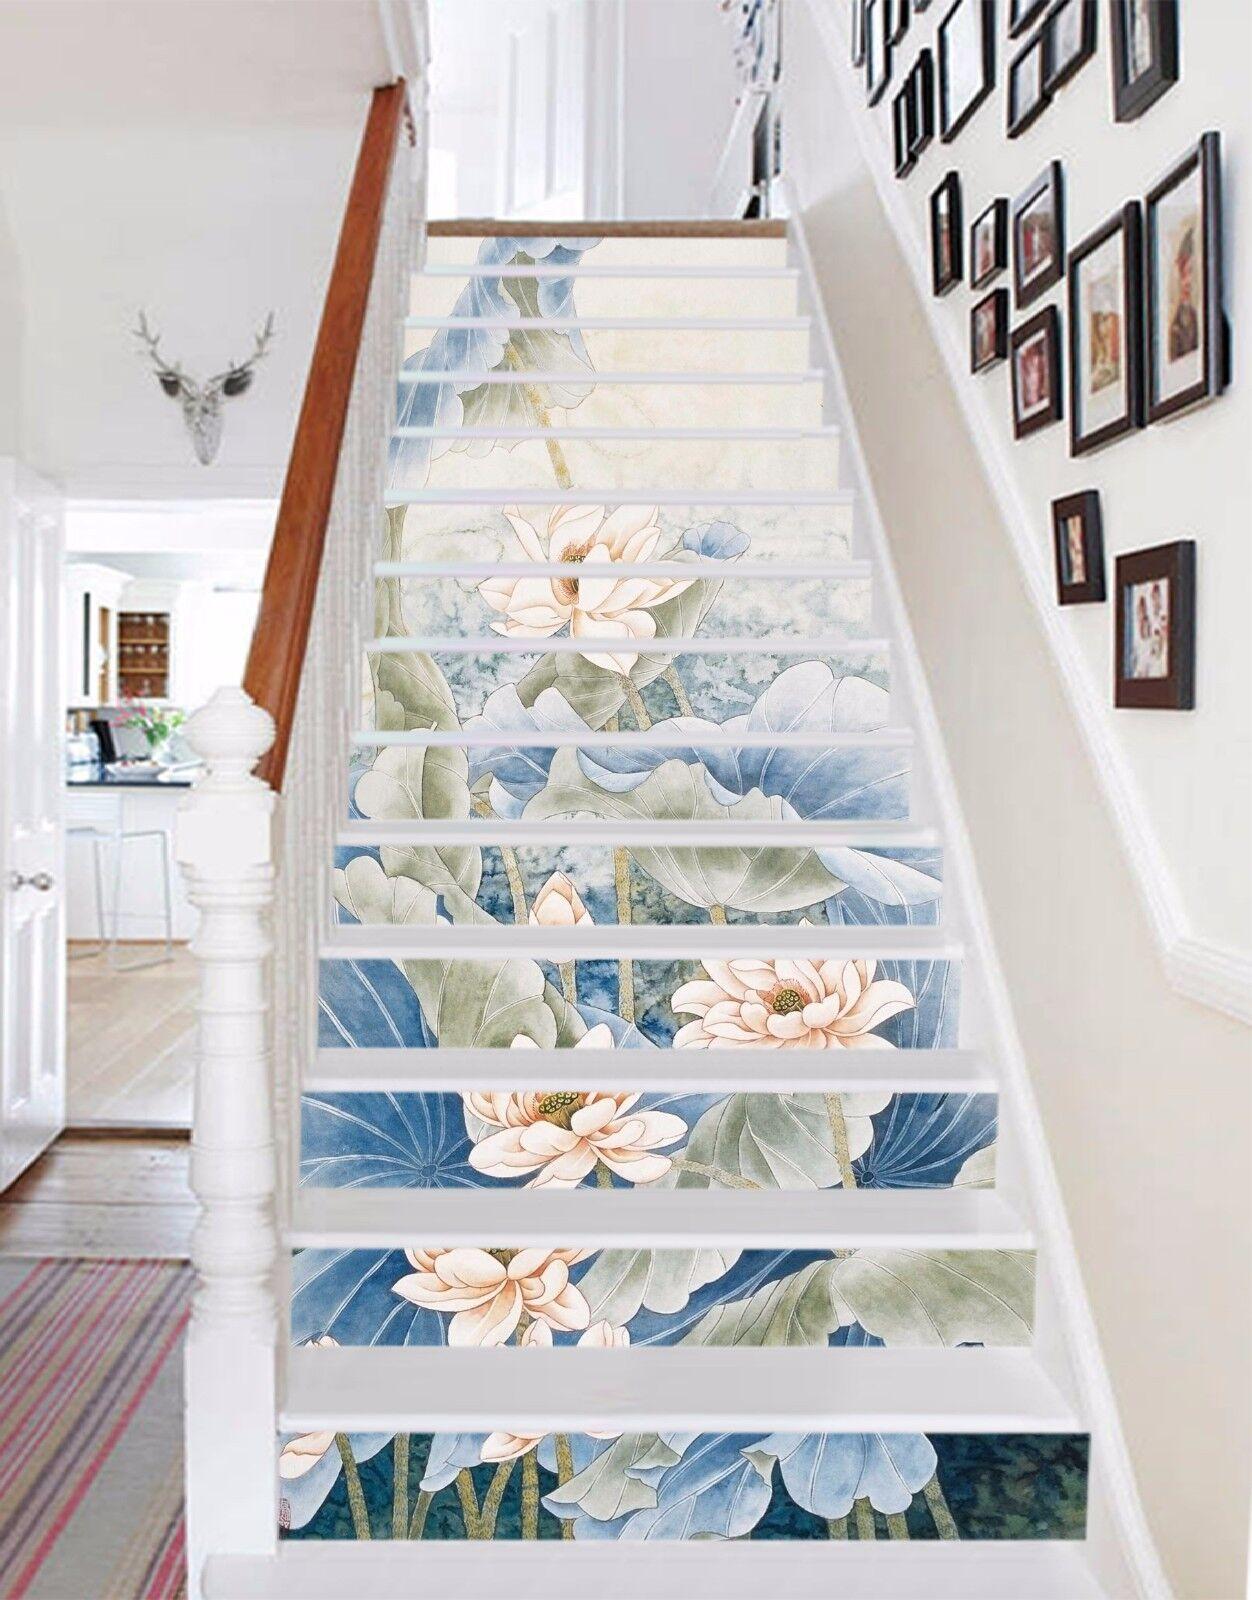 3D Flower leaf 337 Stair Risers Decoration Photo Mural Vinyl Decal Wallpaper UK